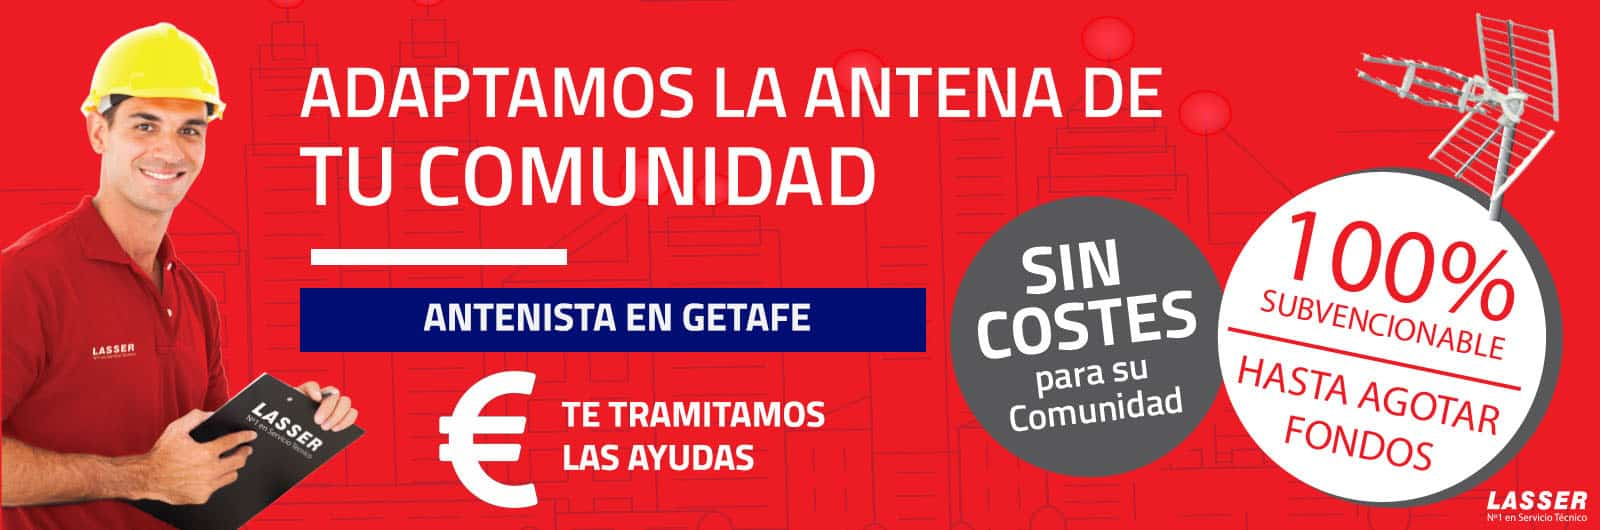 segundo-dividendo-digital-antena-comunidades-promocion-getafe